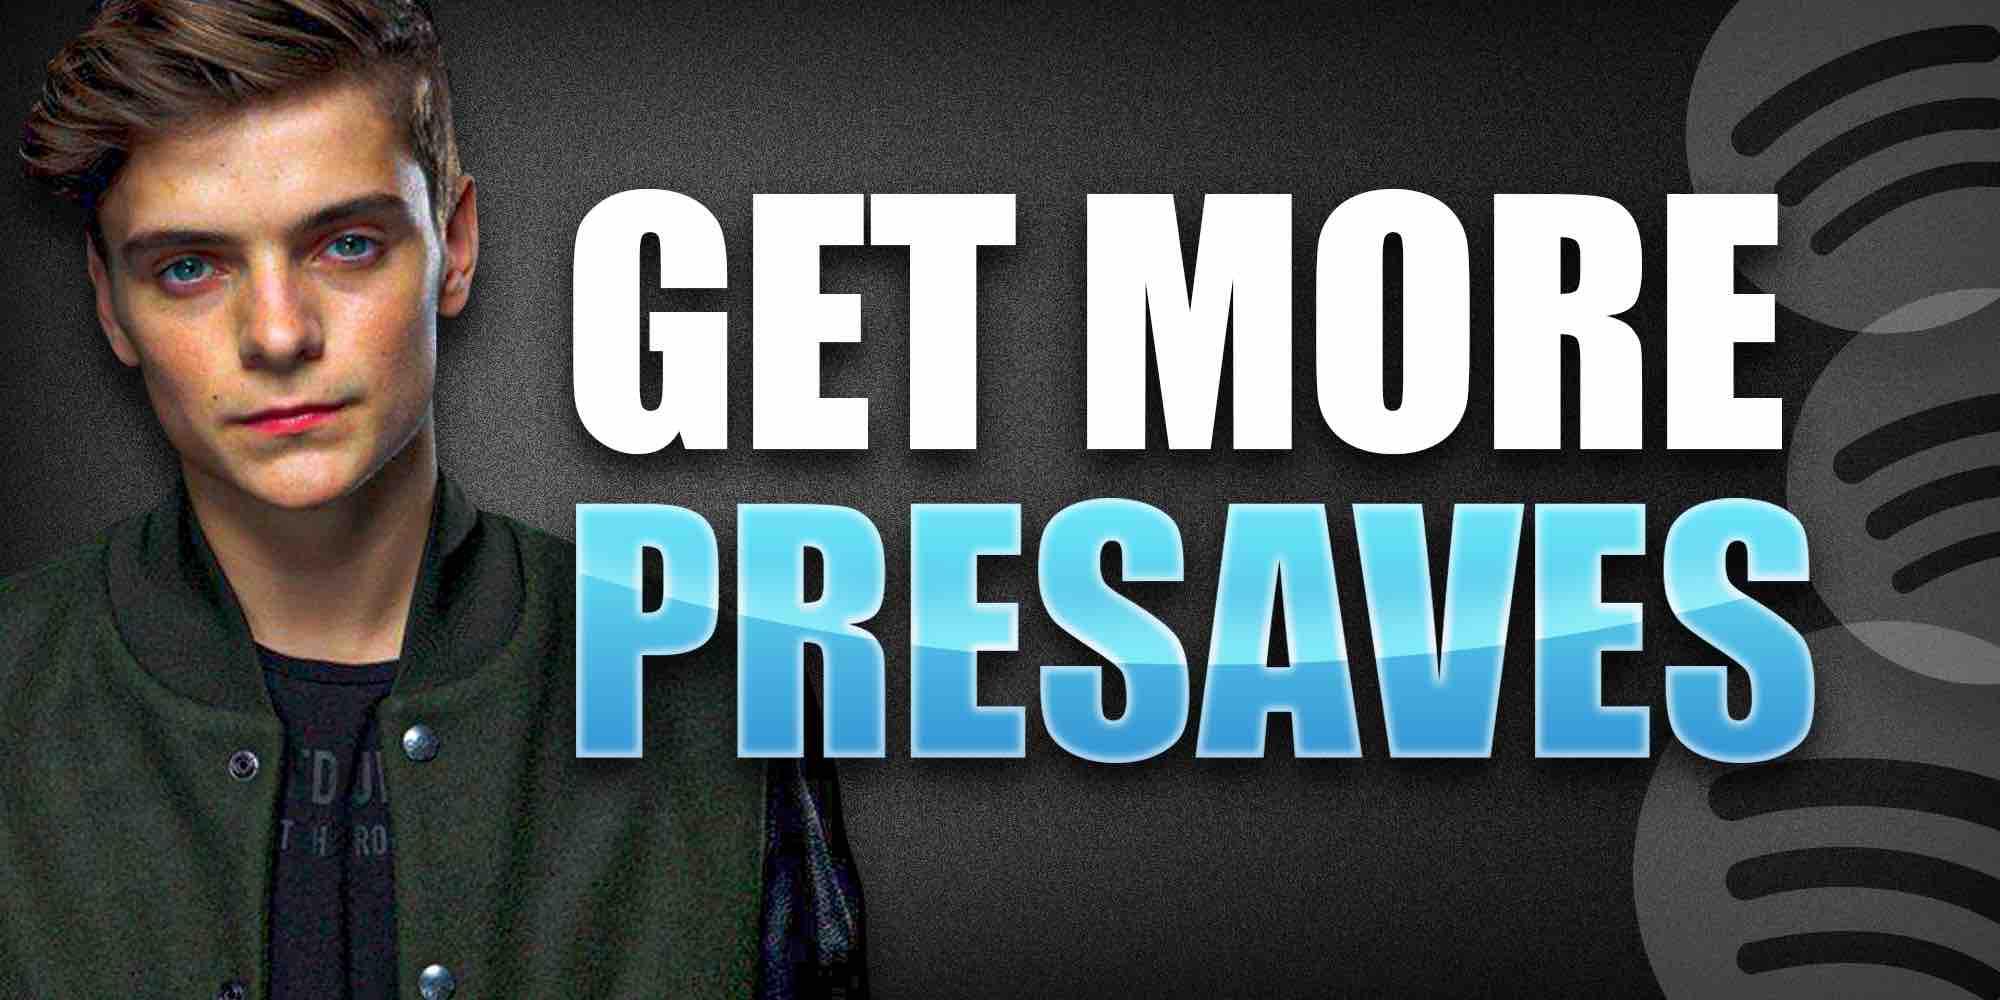 Get more presaves